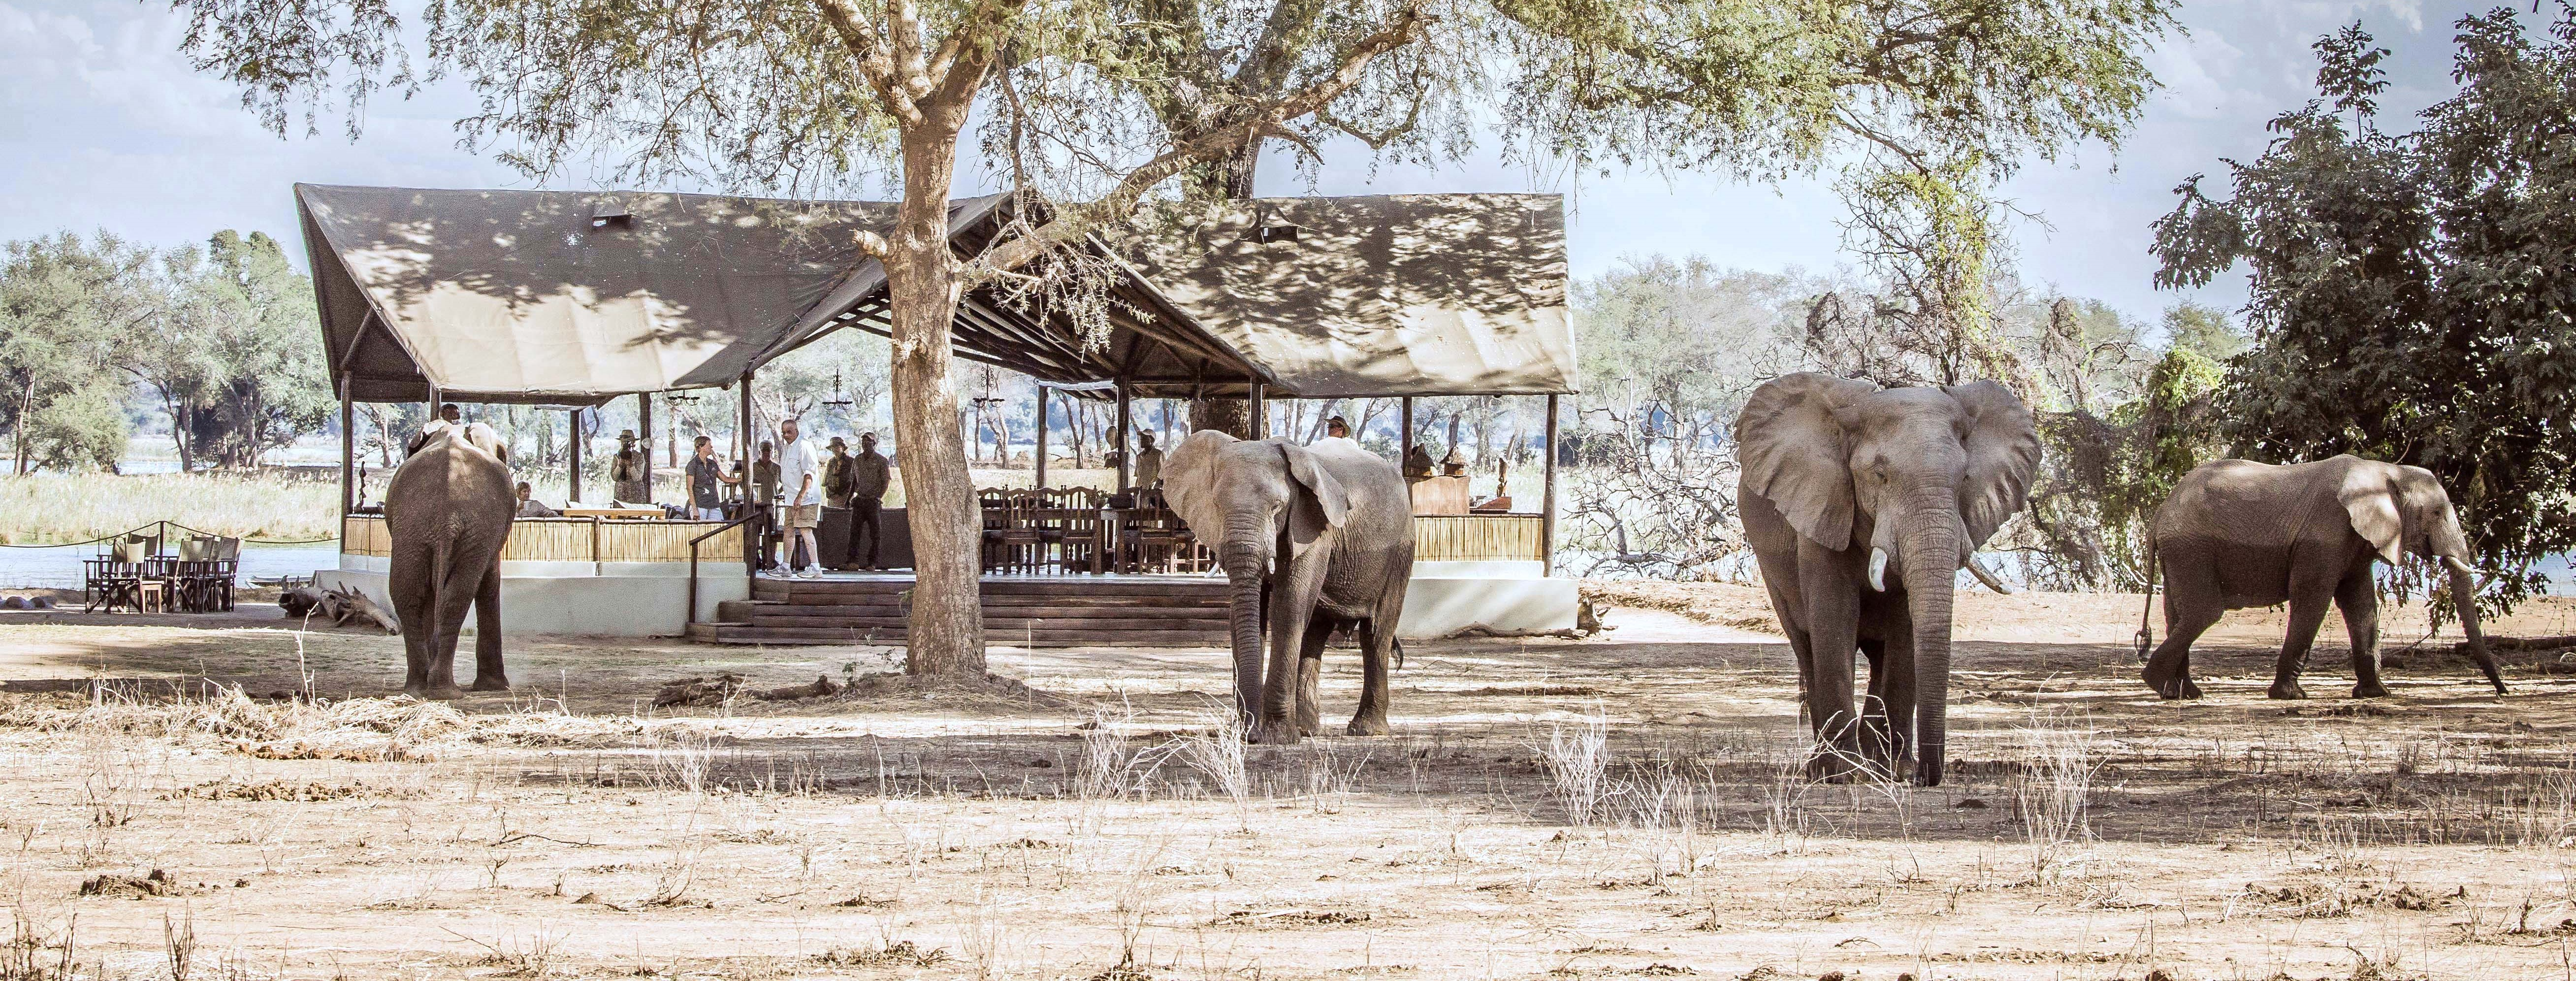 old-mondoro-safari-camp